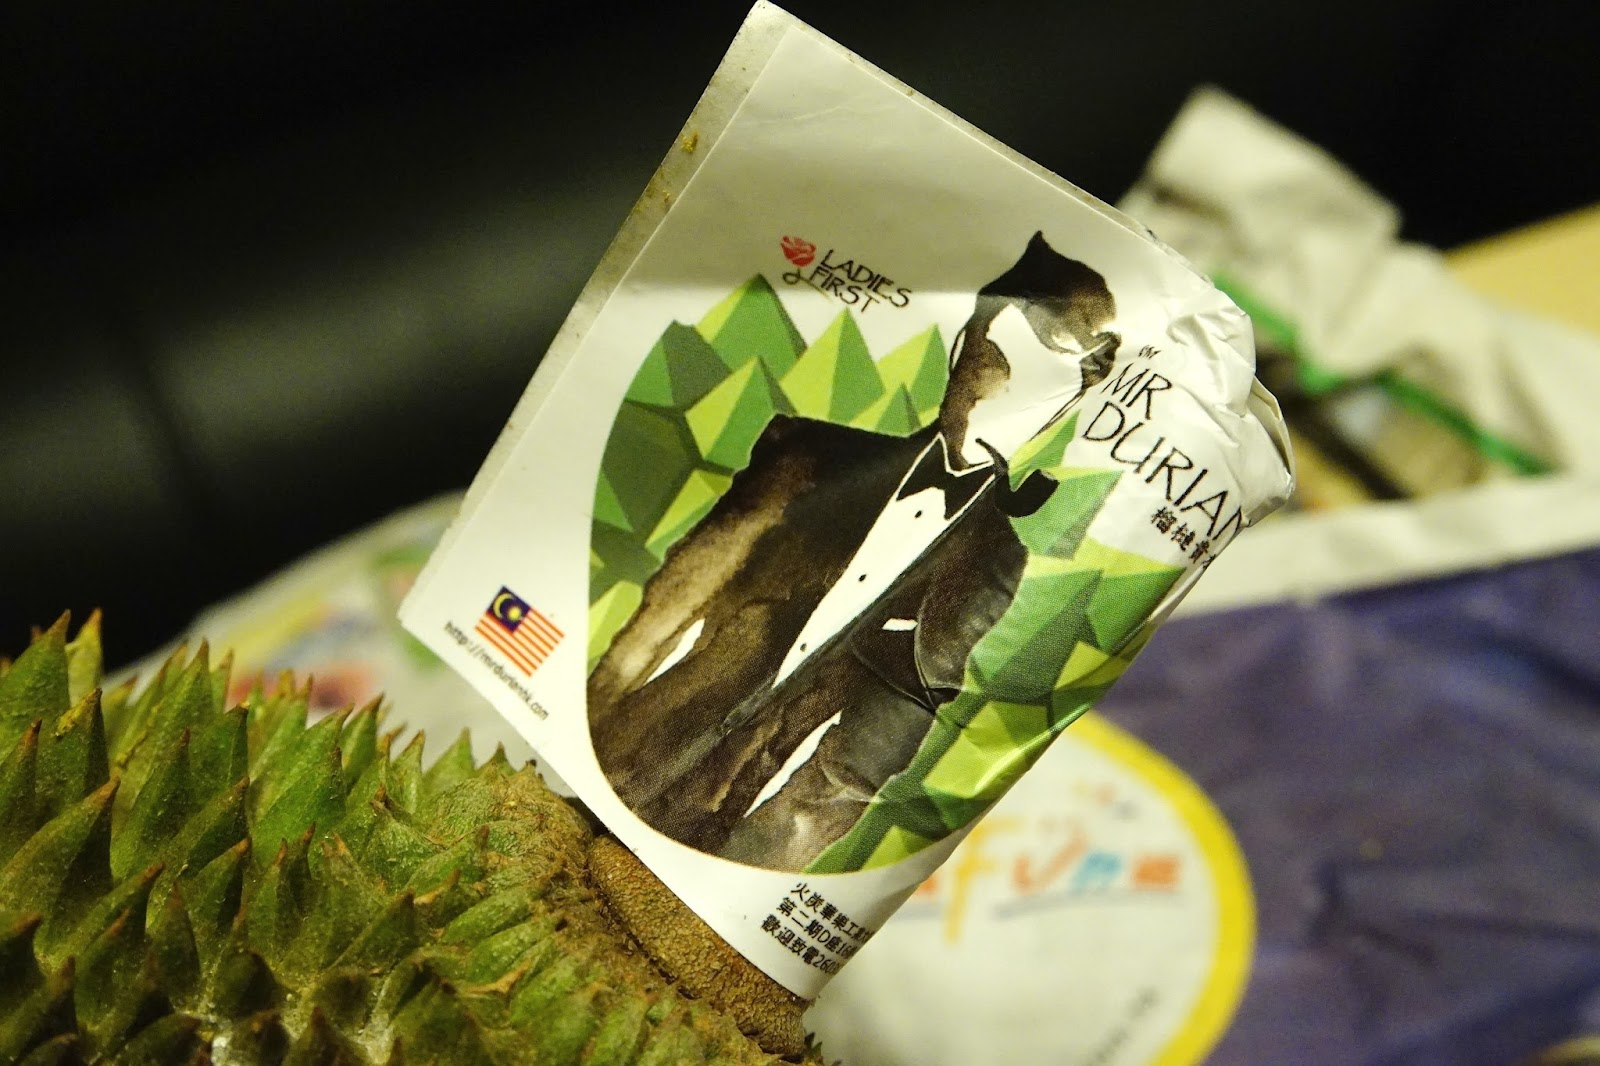 榴槤貴族 Mr. Durian:榴心柔 SeeWide